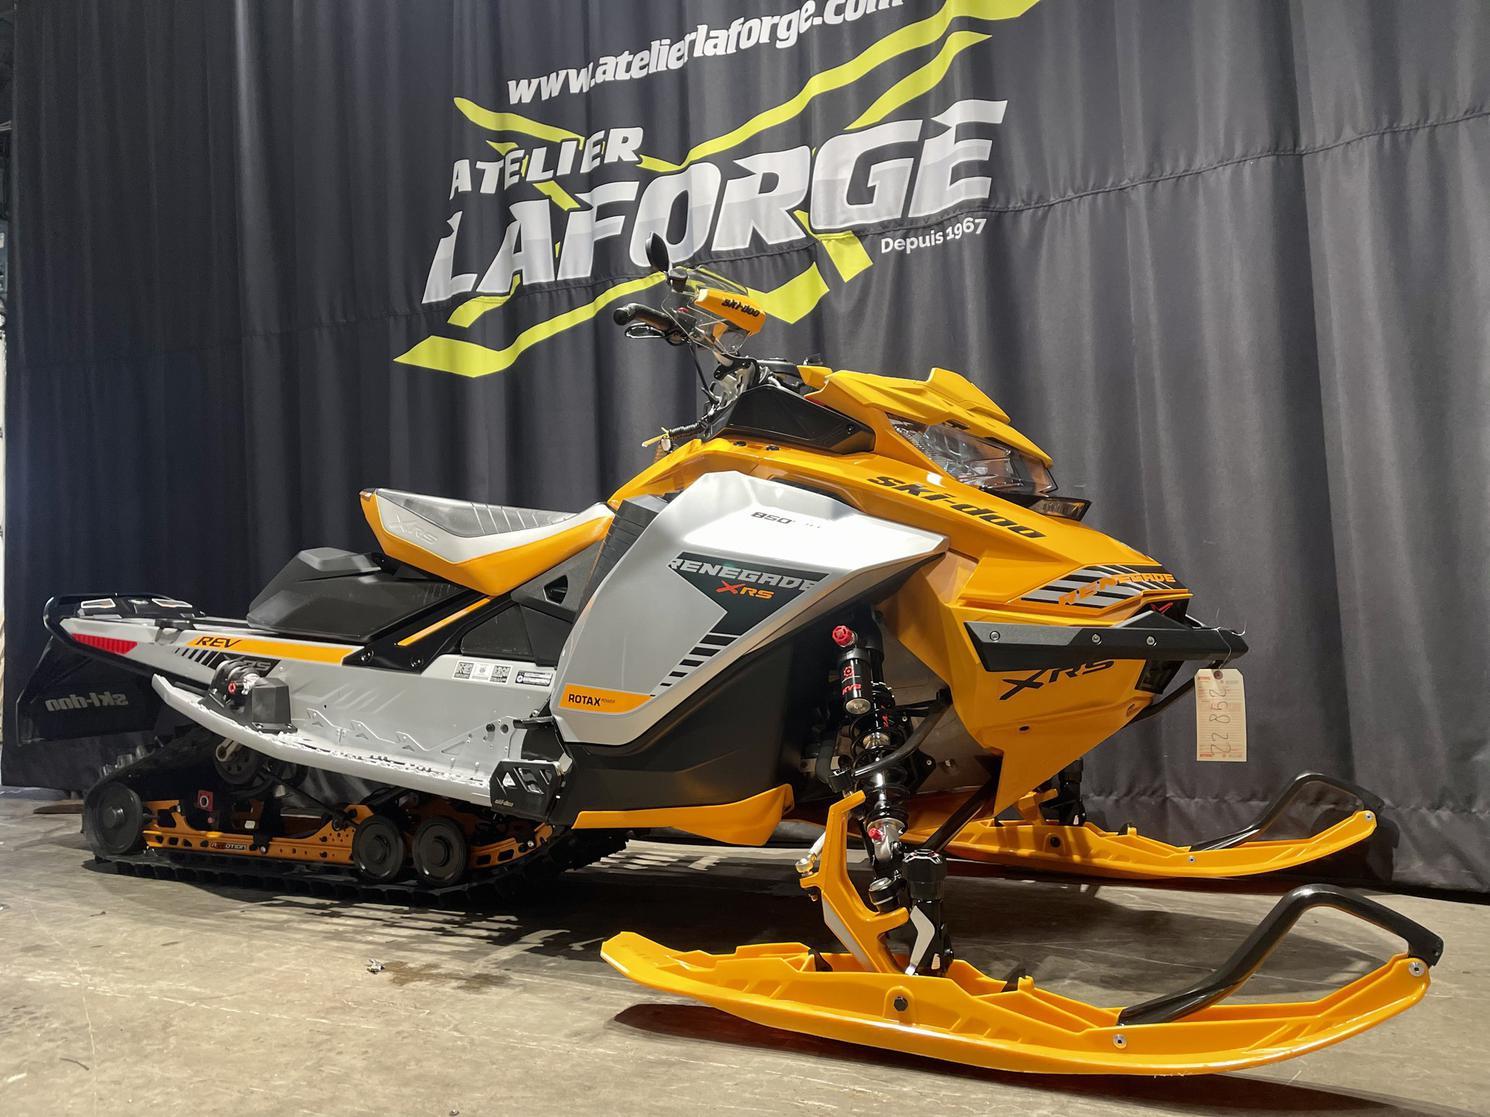 2019 Ski-doo renegade 850 xrs